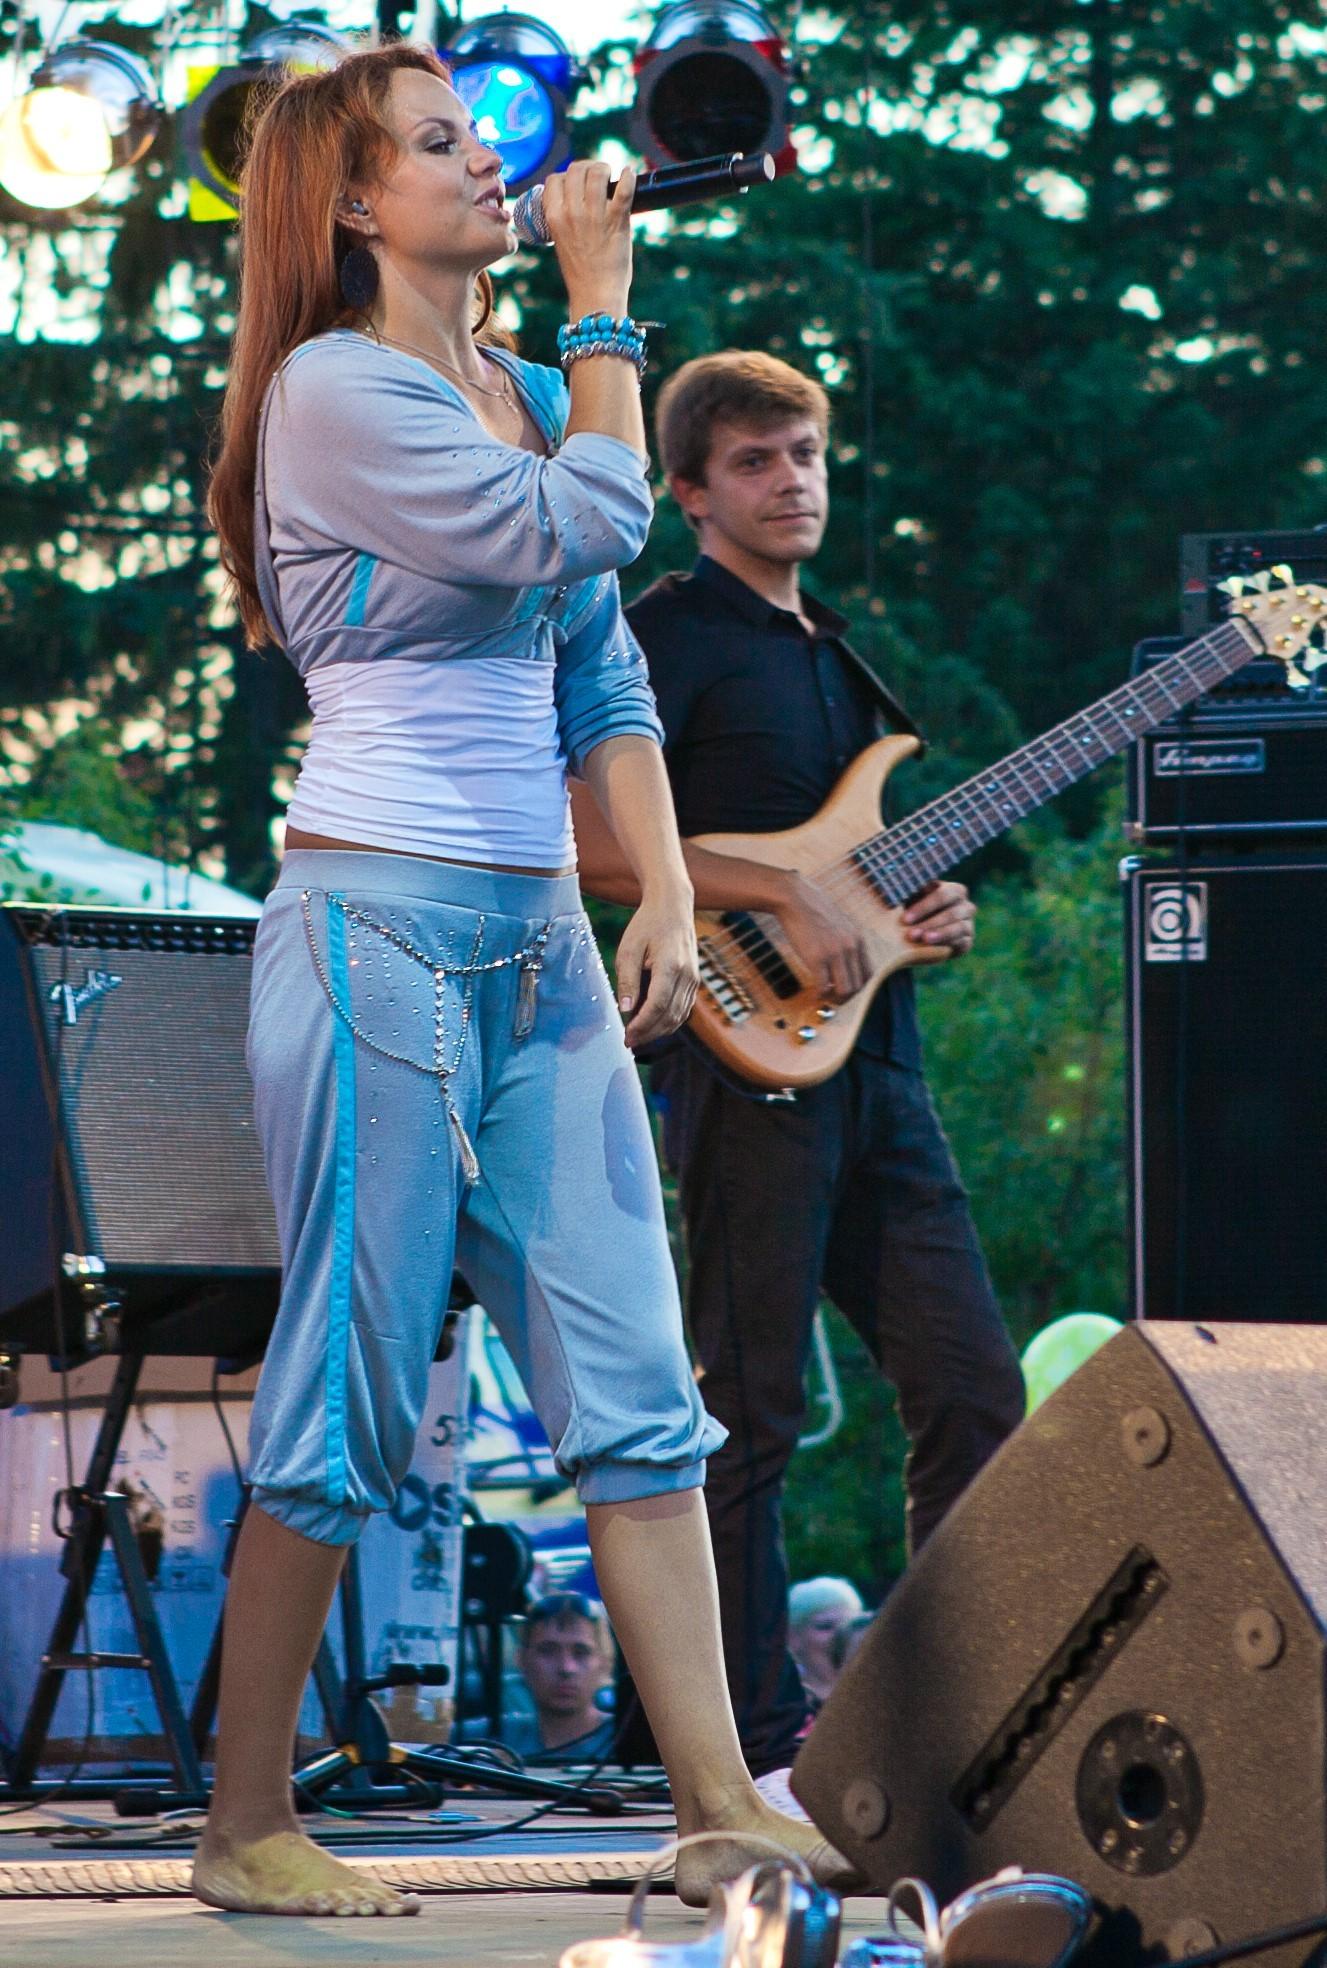 https://pics.wikifeet.com/Marina-Maksimova-Feet-2343124.jpg